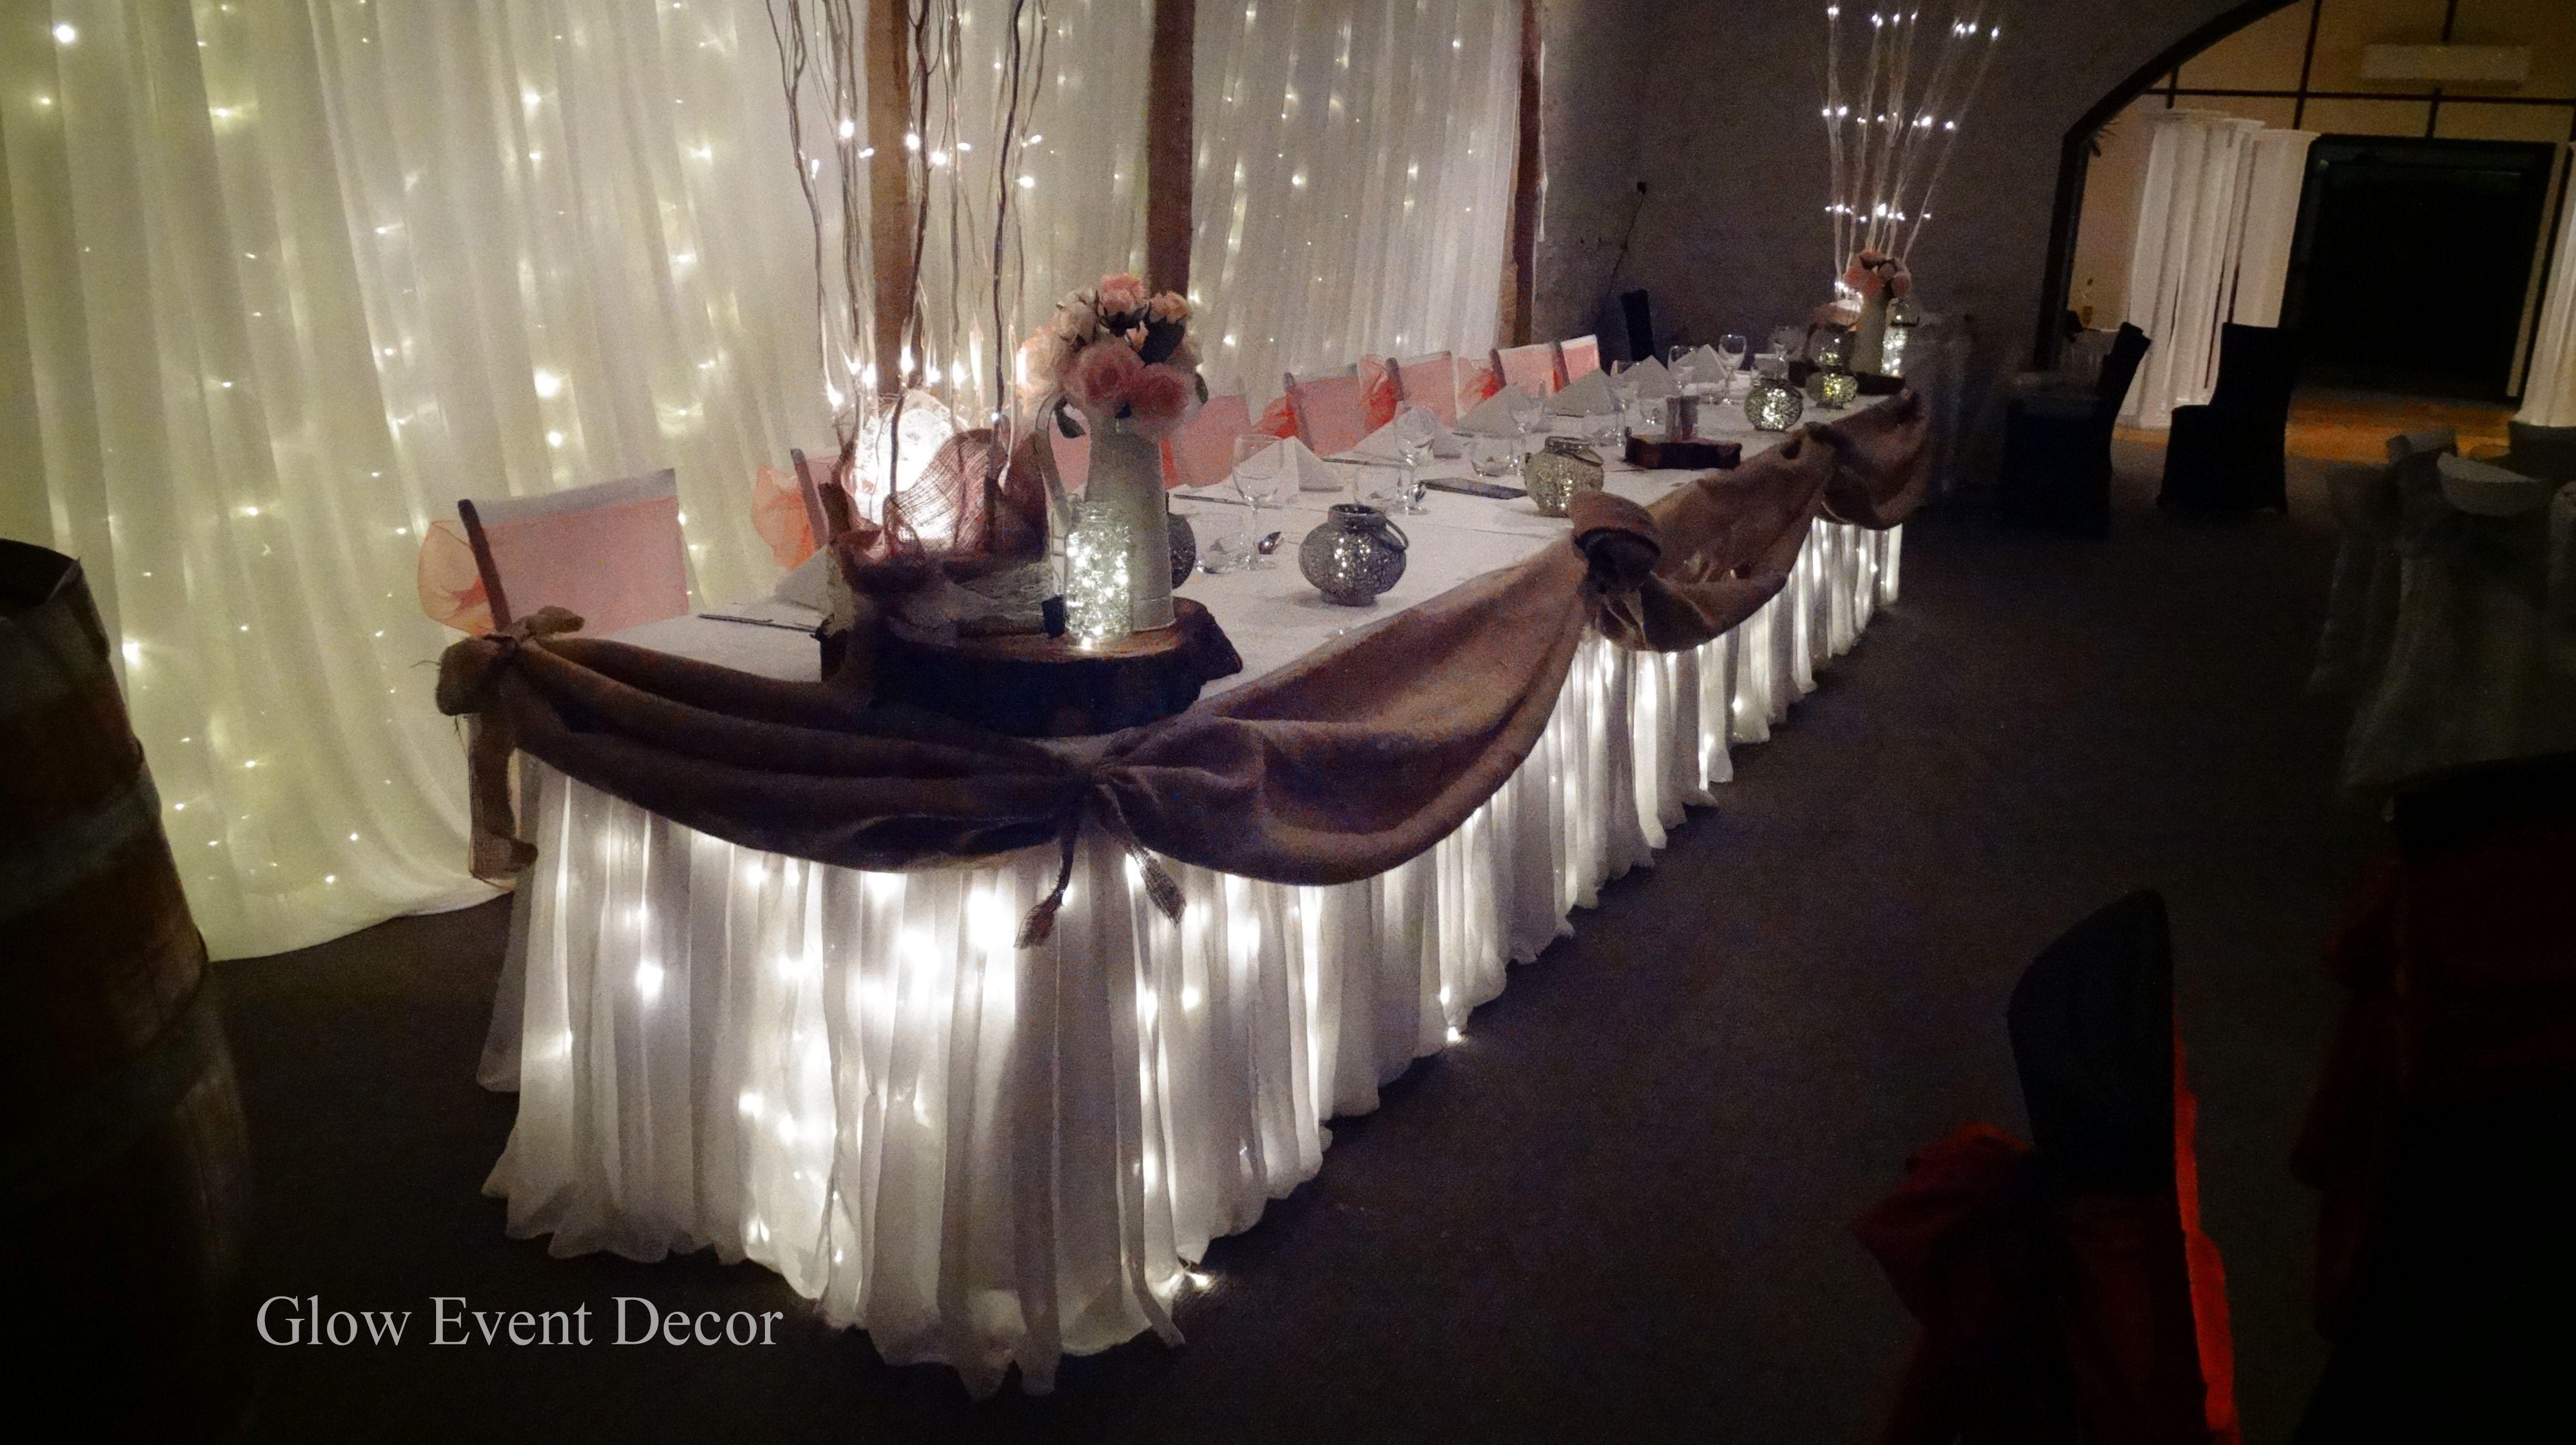 Rustic hessian bridal table twinkle fairy lights with rustic twinkle rustic hessian bridal table twinkle fairy lights with junglespirit Choice Image